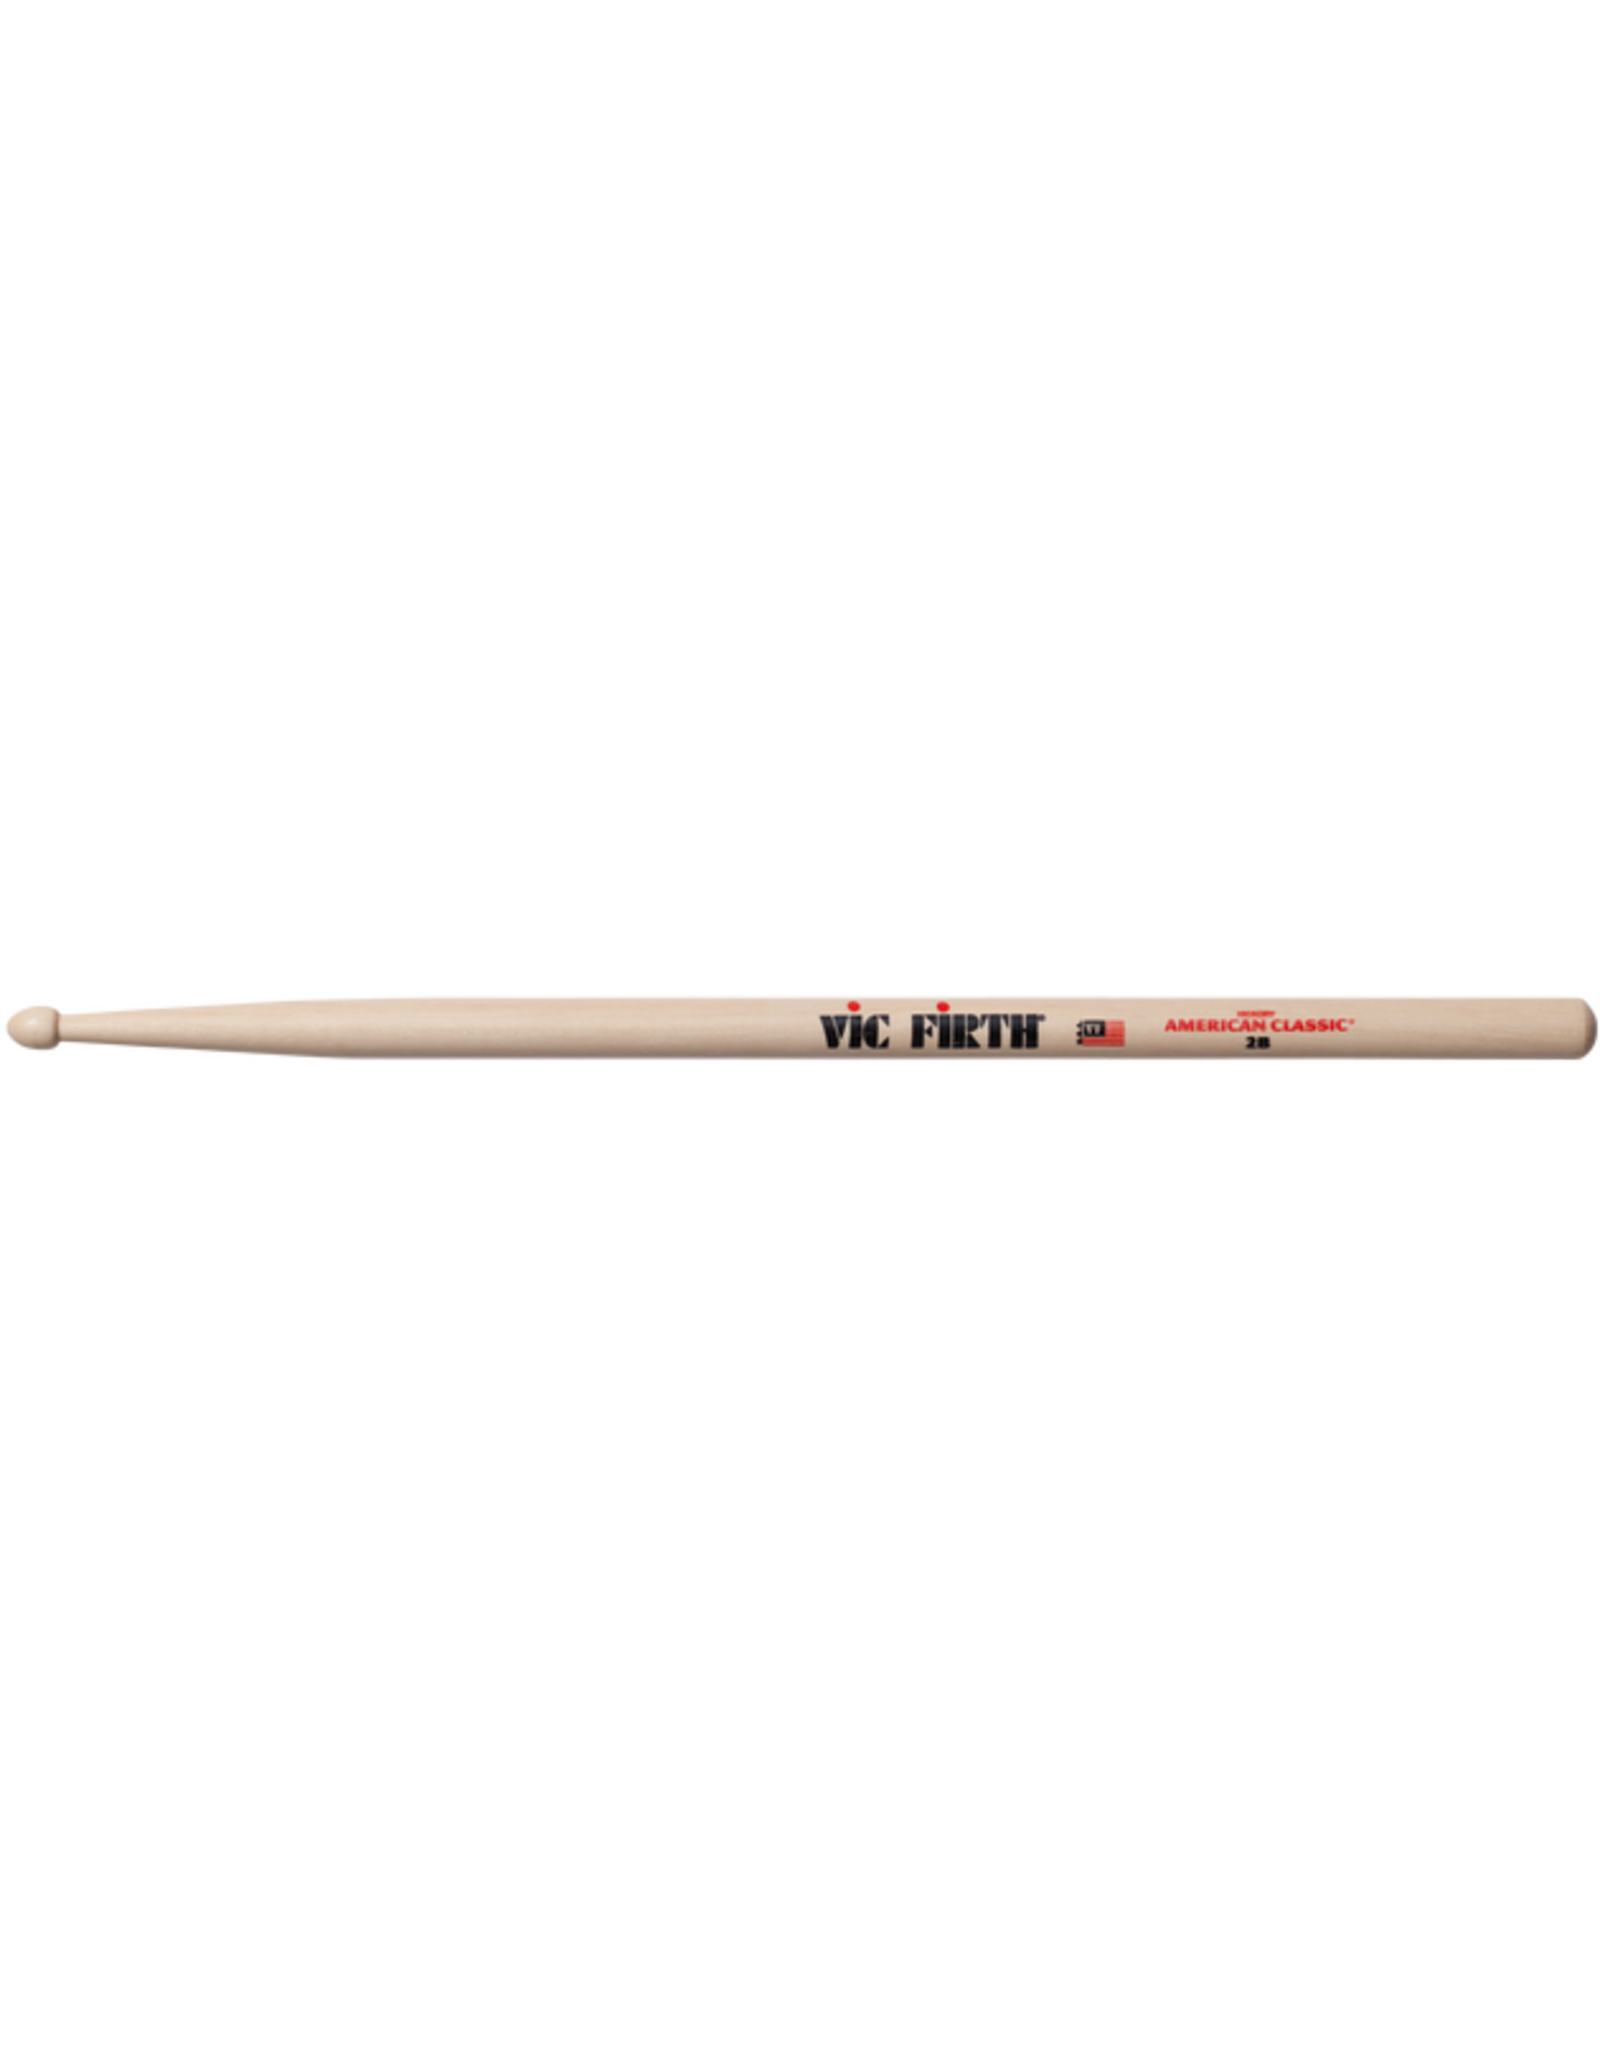 Vic Firth Vic Firth American Classic Drumsticks